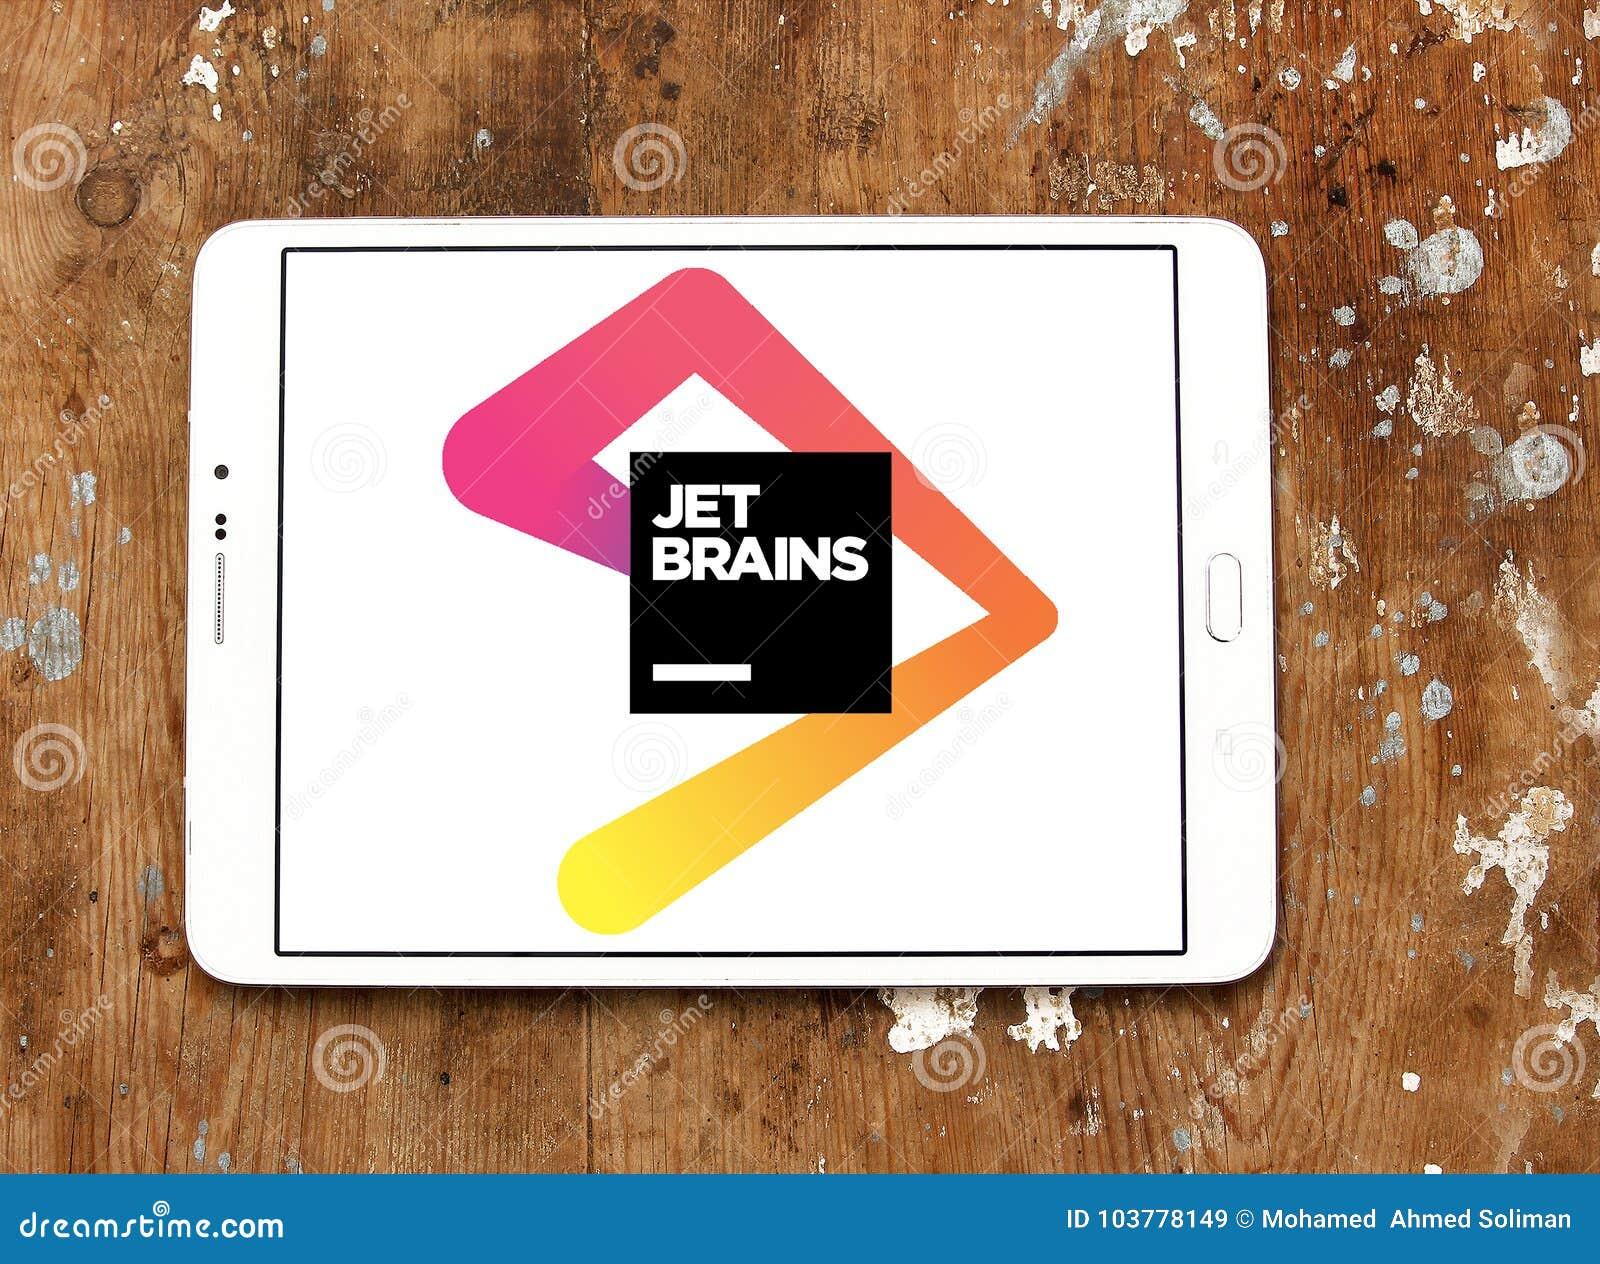 JetBrains Software Development Company Logo Editorial Stock Image